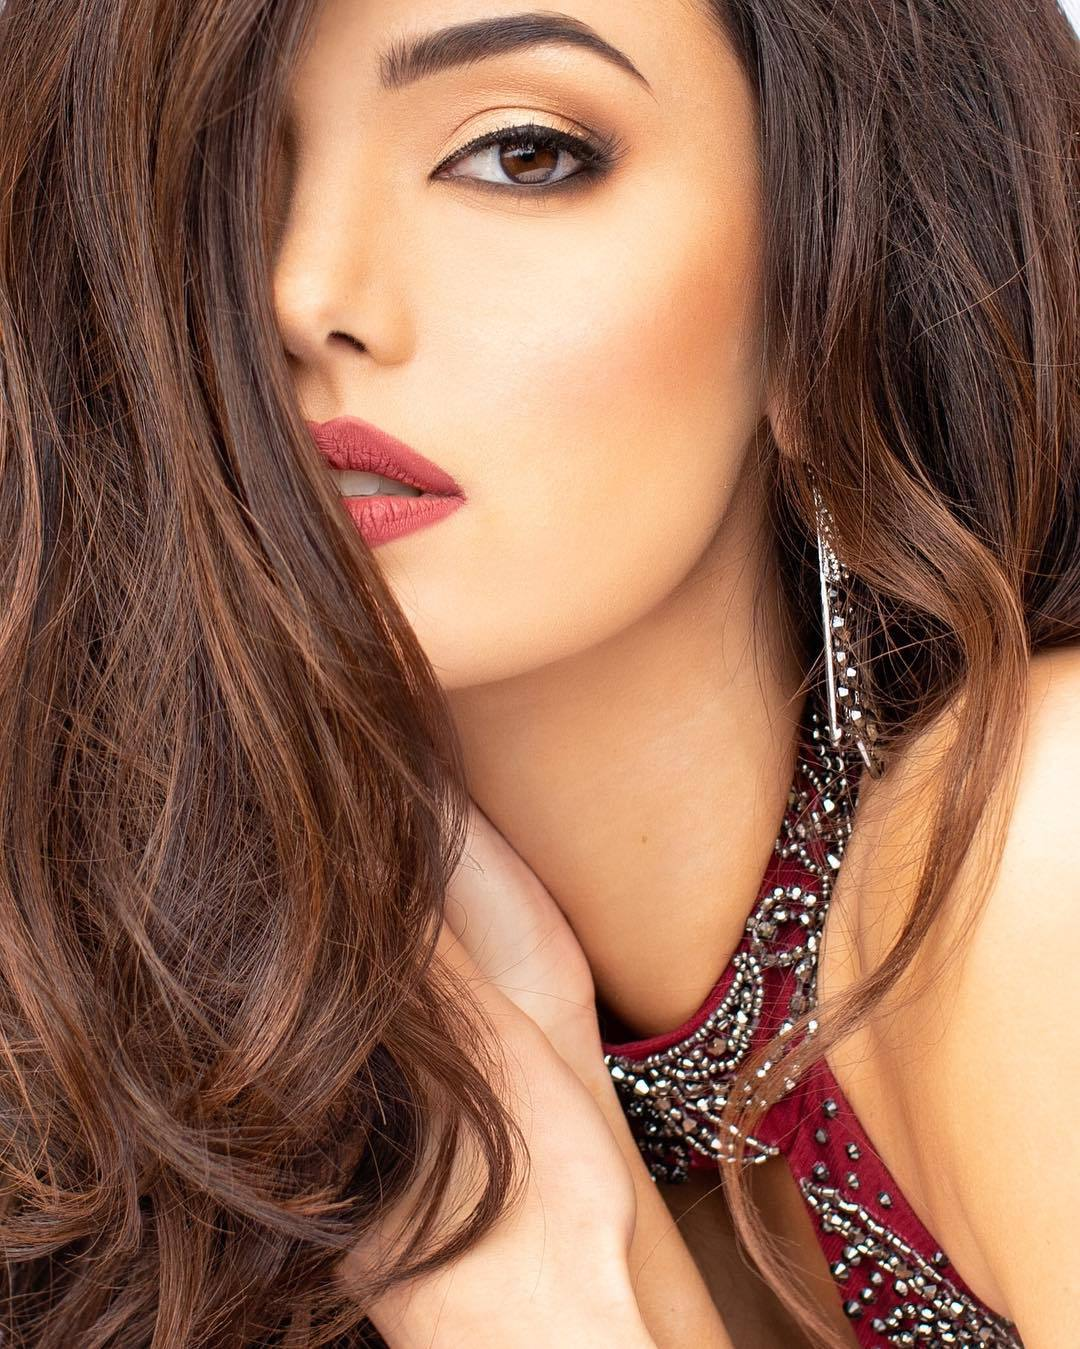 alejandra gonzalez, top 2 de miss usa 2019. 51616698_578197499322204_1932166732677011631_n